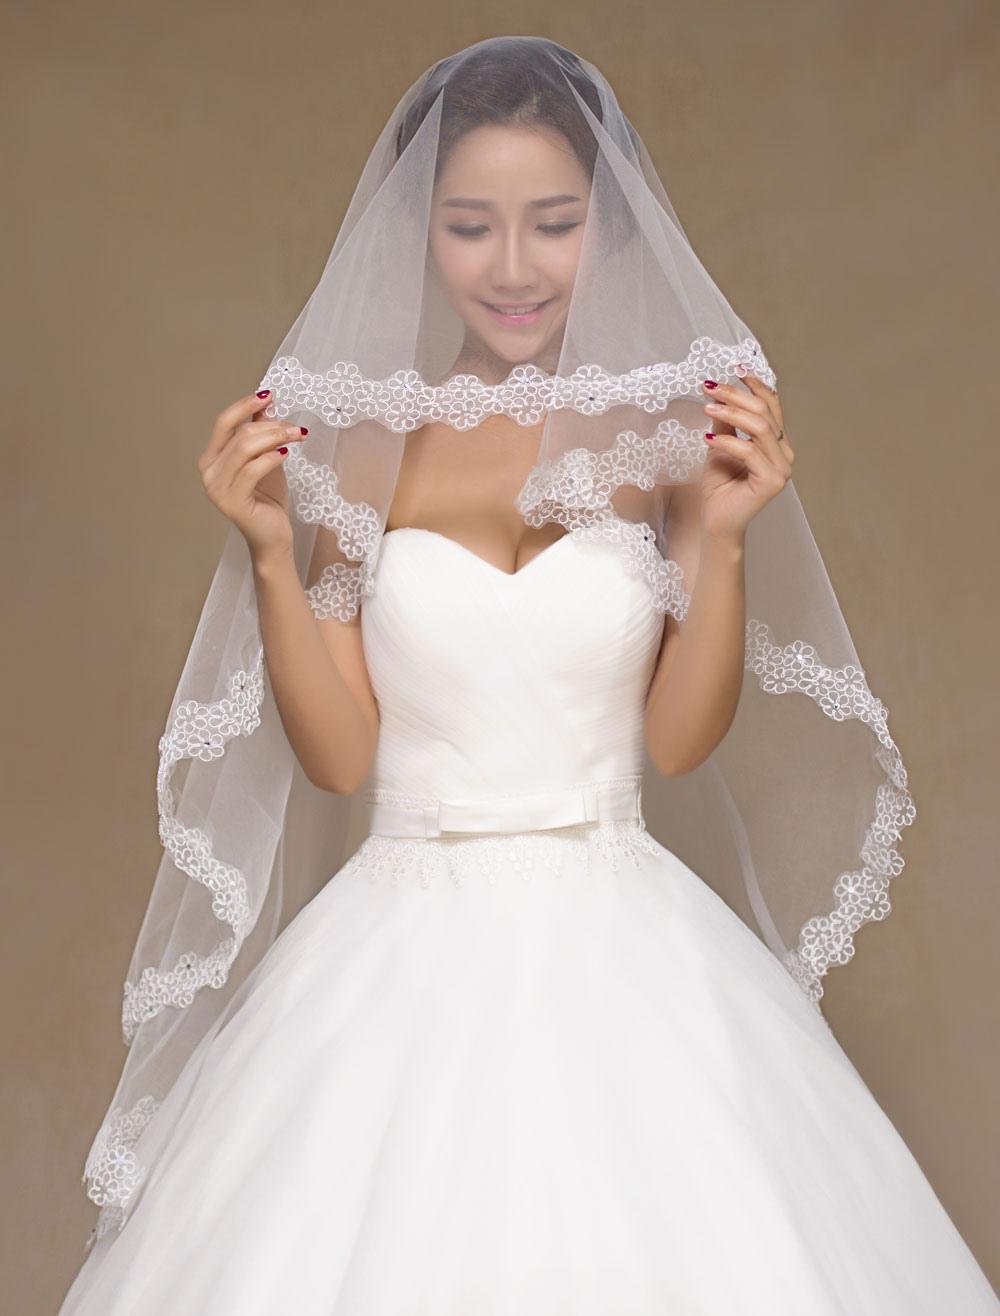 Ivory Semi-Sheer Lace Tulle Bridal Veil